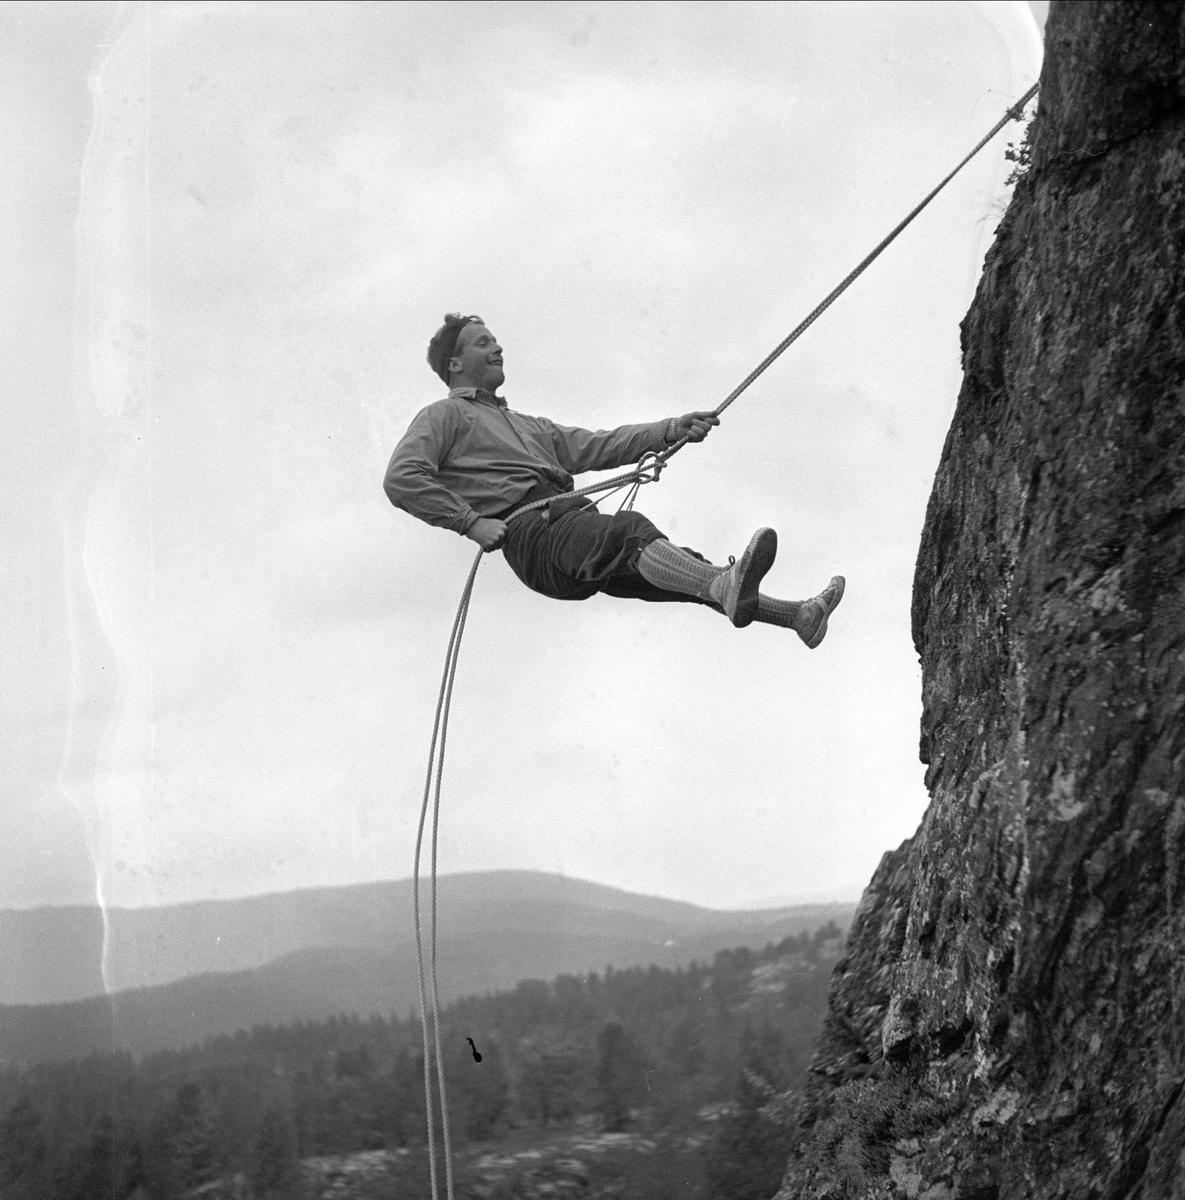 Fjellklatring. Vinstra juni 1950. Fjellførerskole.